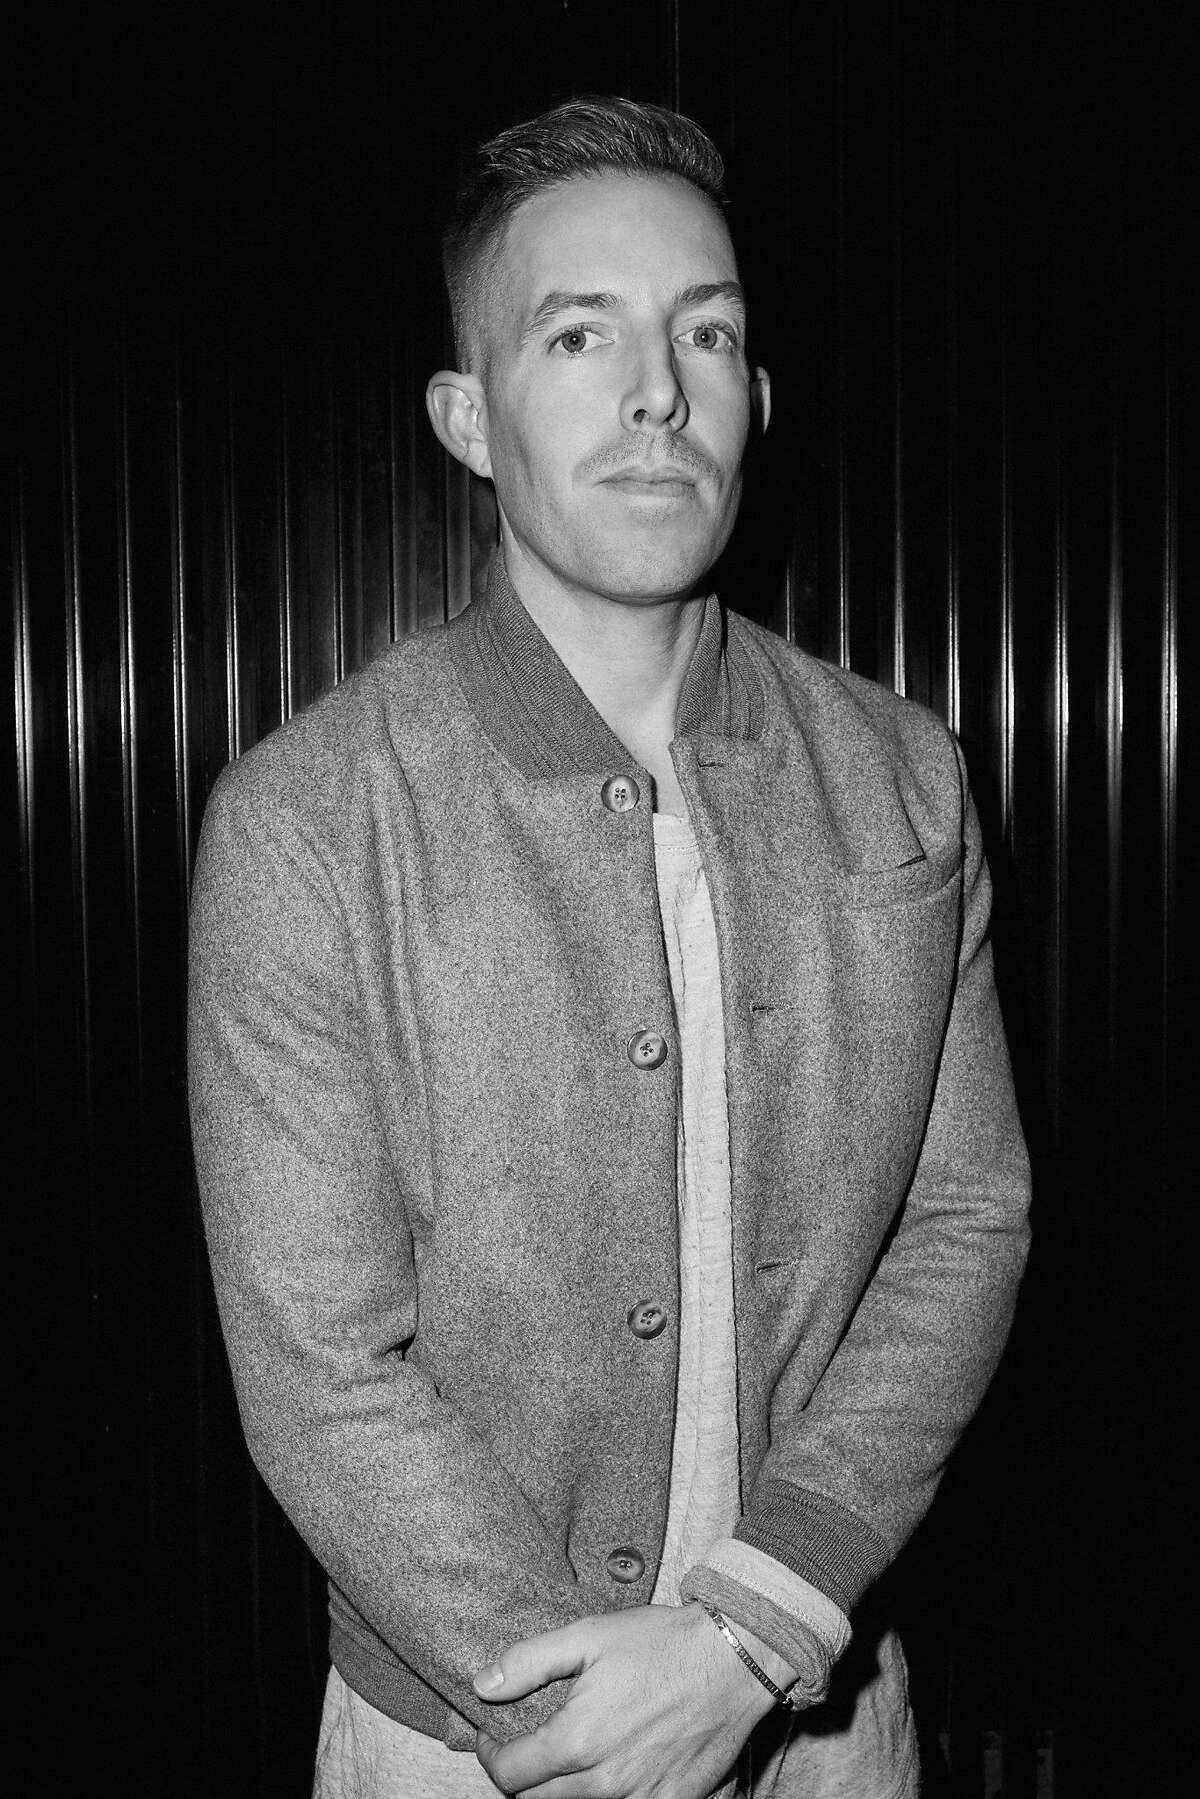 Fashion designer John Elliott